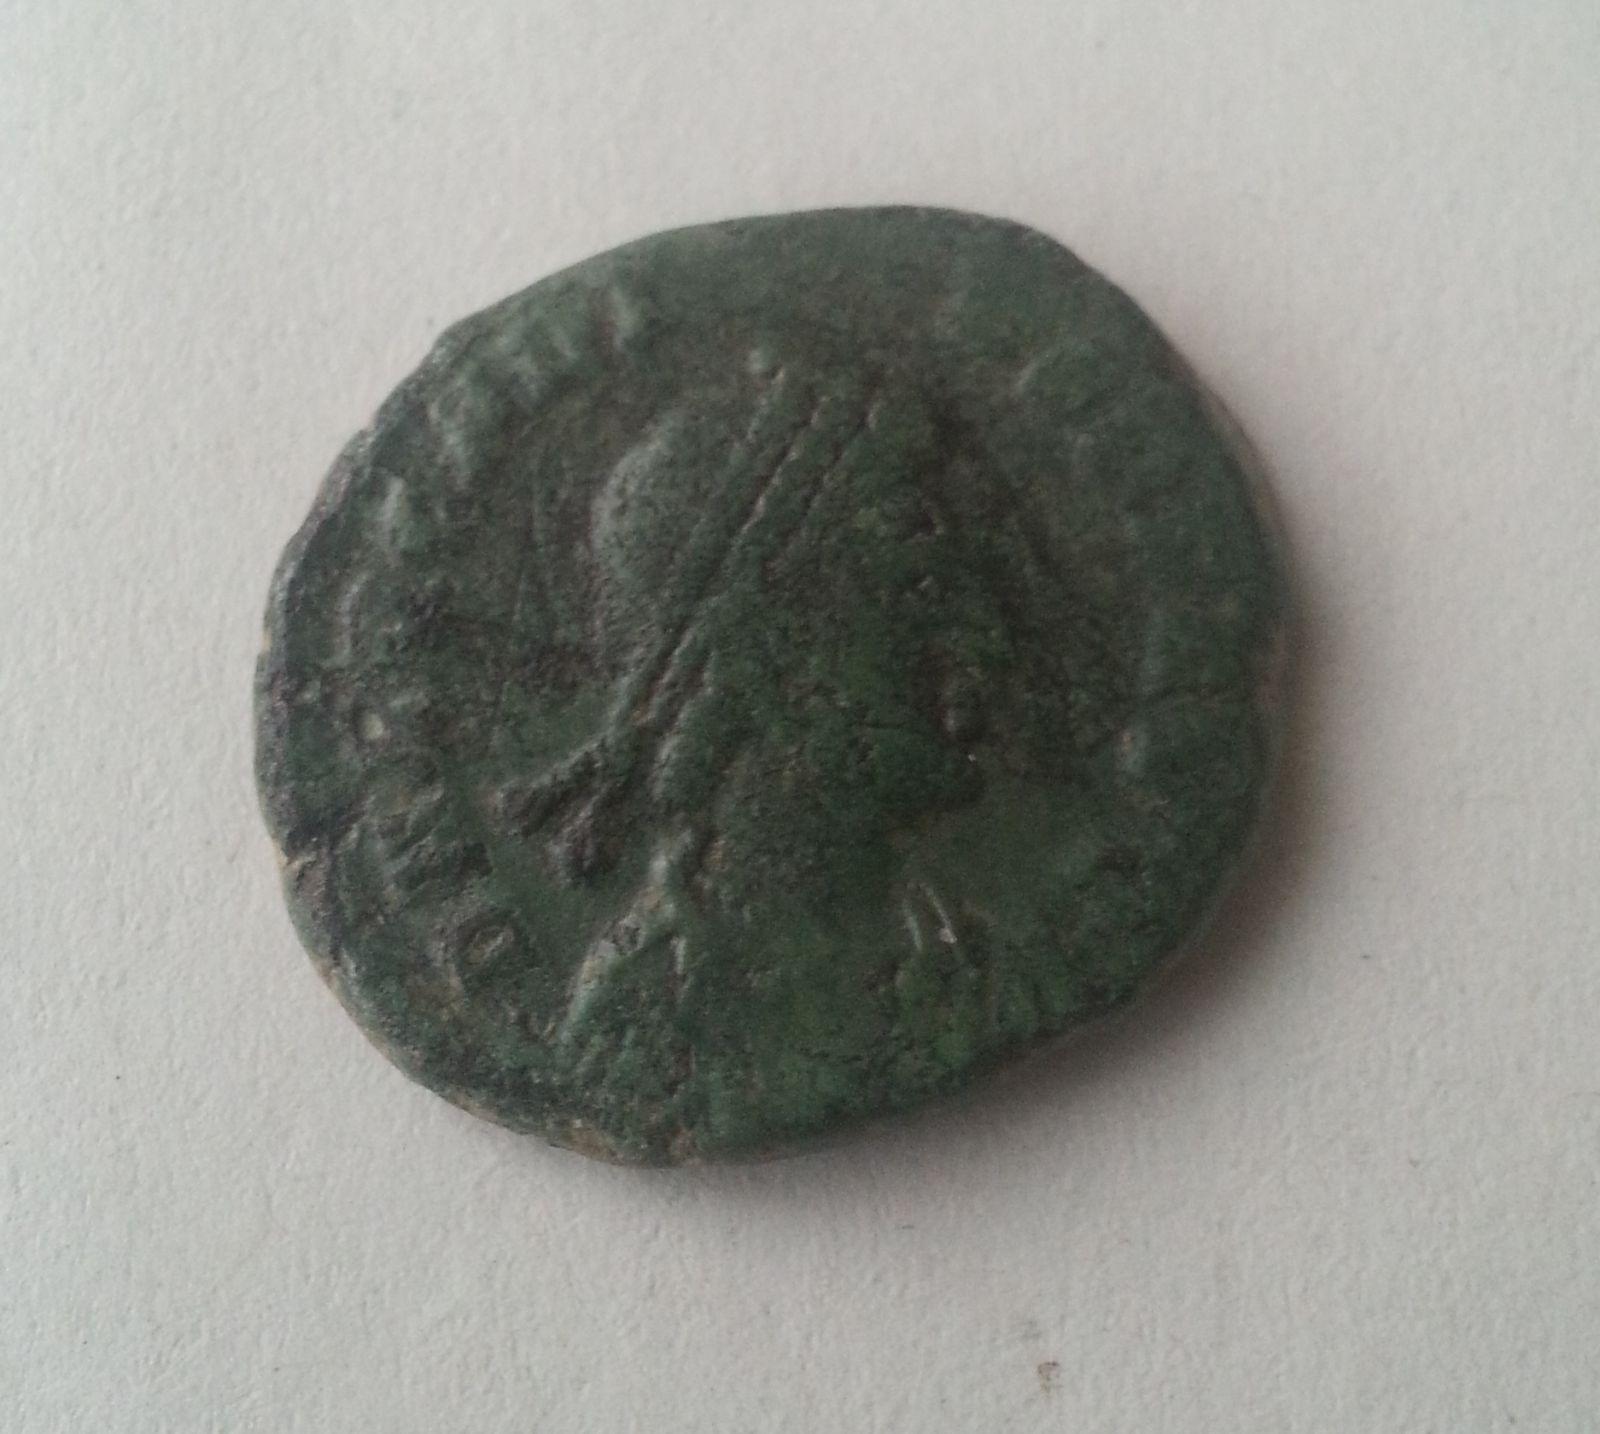 AE-Maiorina-Gloria Romanorum, Arcadius, 383-408, mincovna Heraclea, S:20792, Řím-císařství